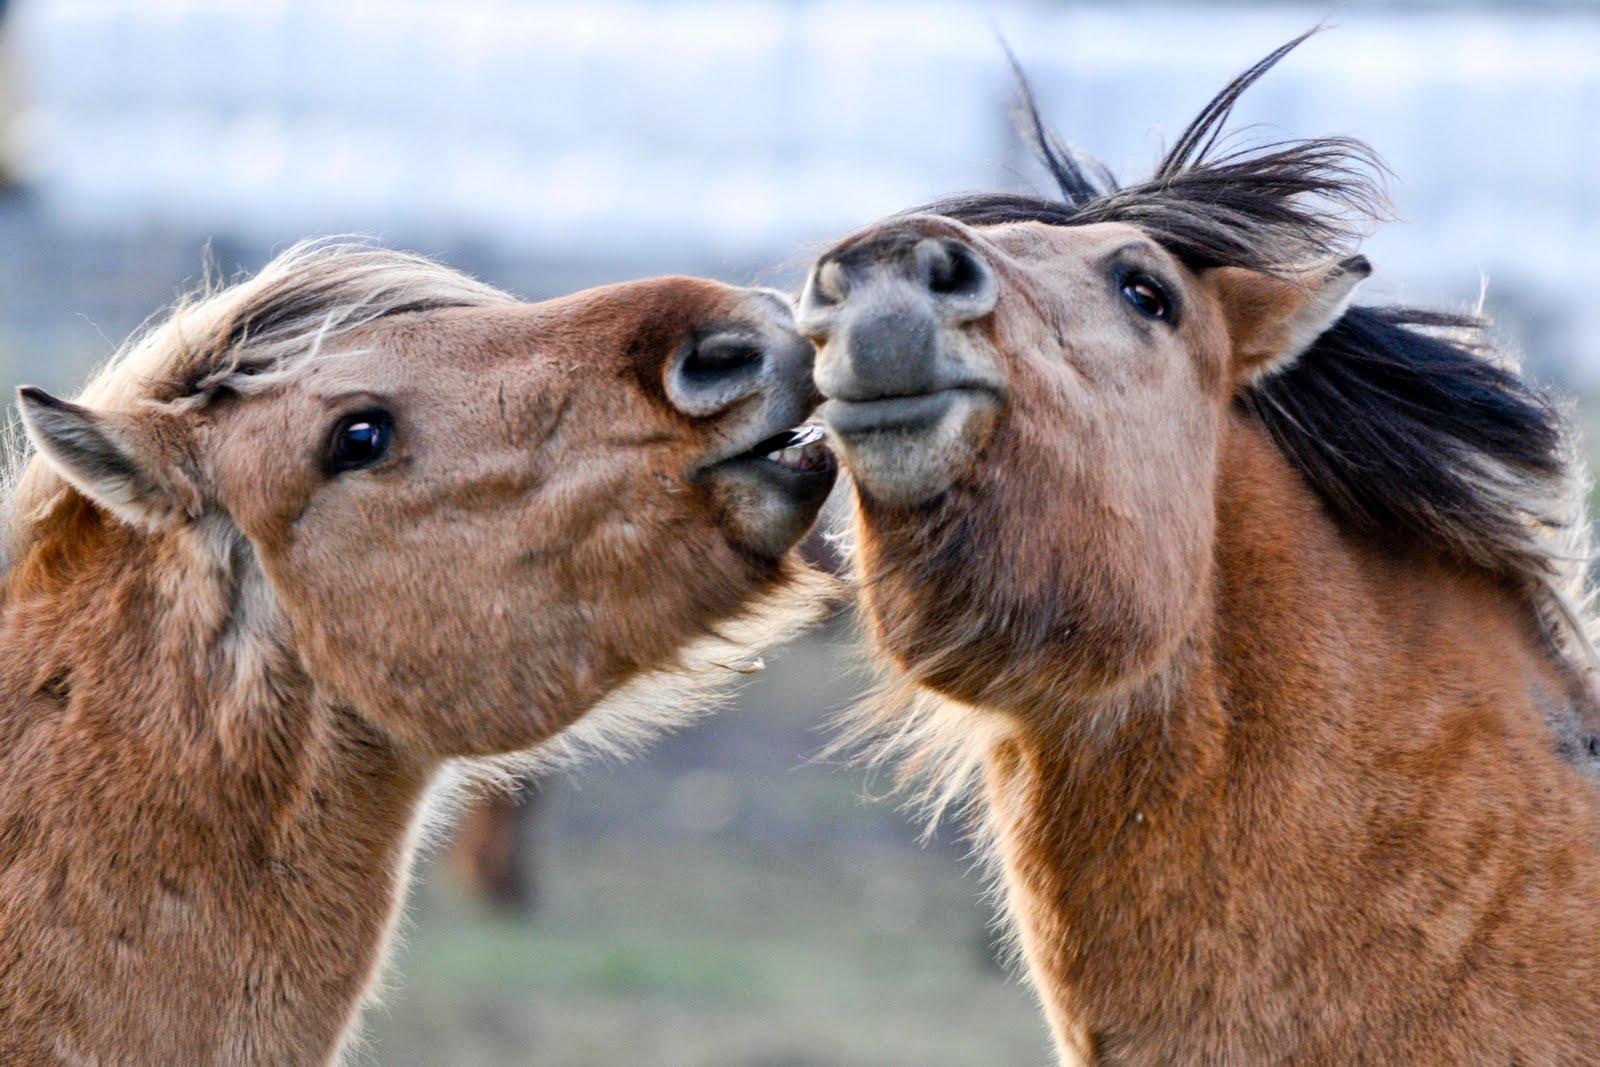 http://www.horseandman.com/?p=34184